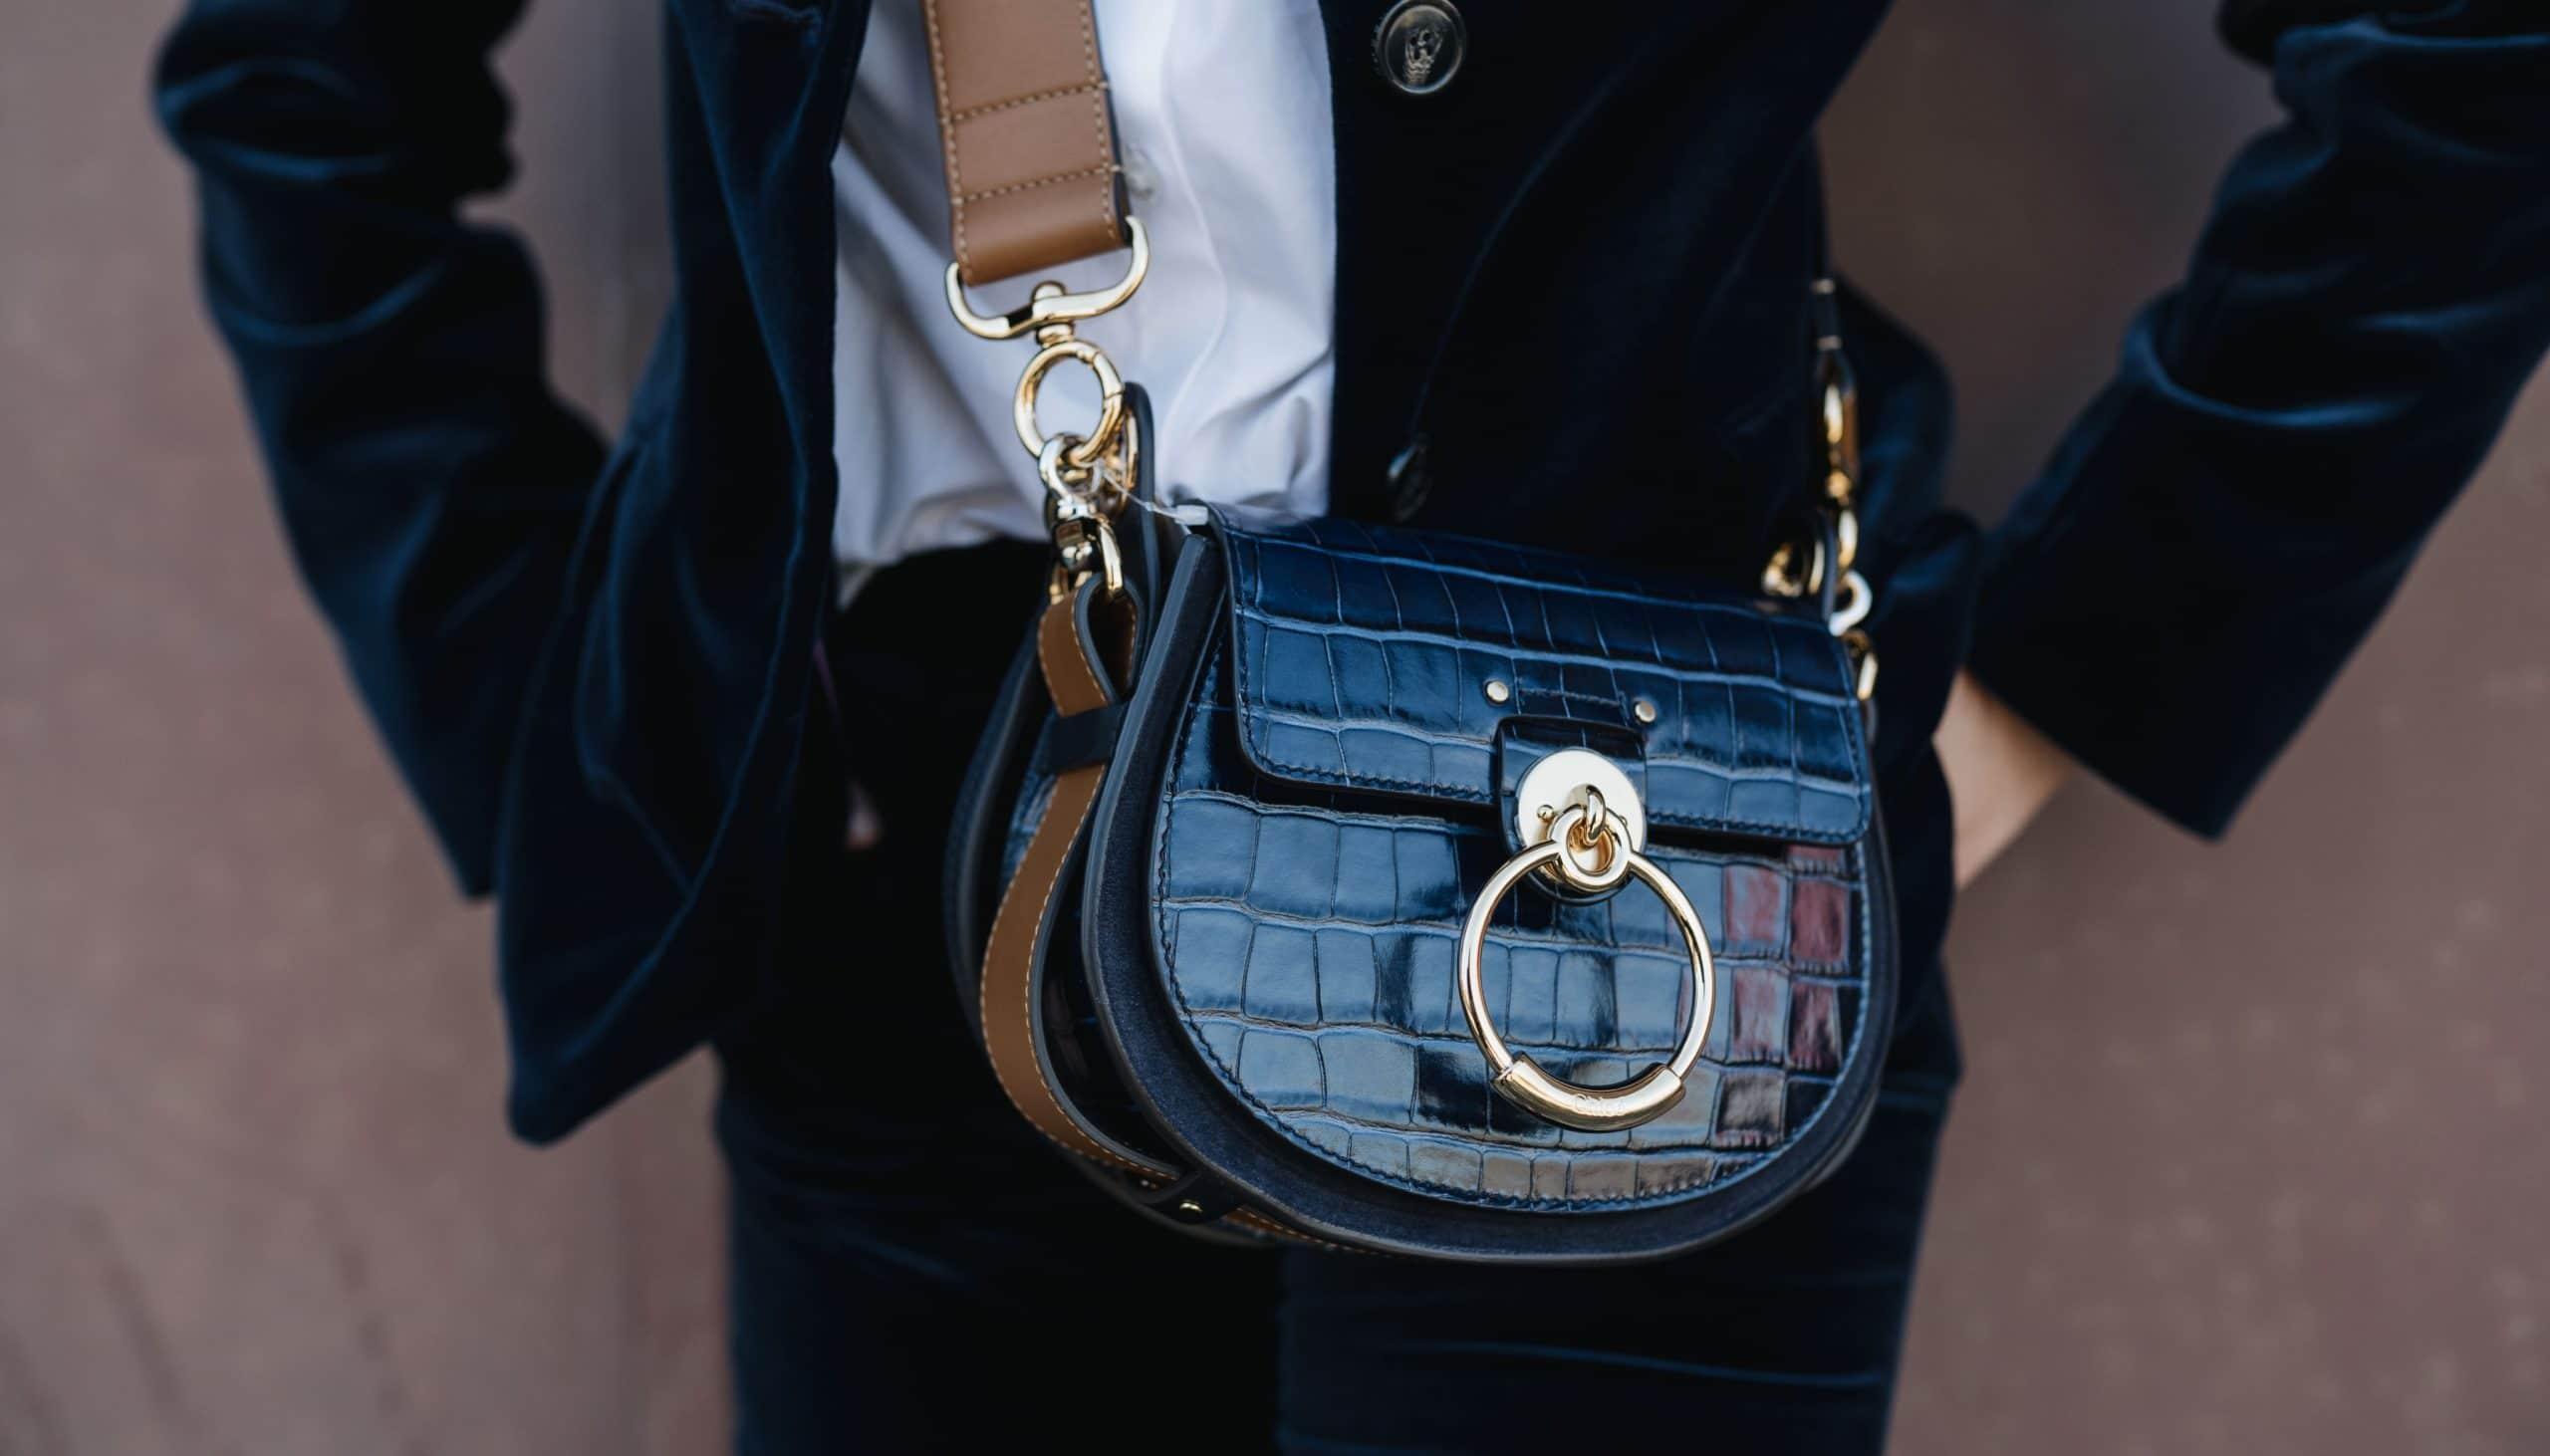 Mode & Beauty: Fashion, Stylingtipps & Outfitideen